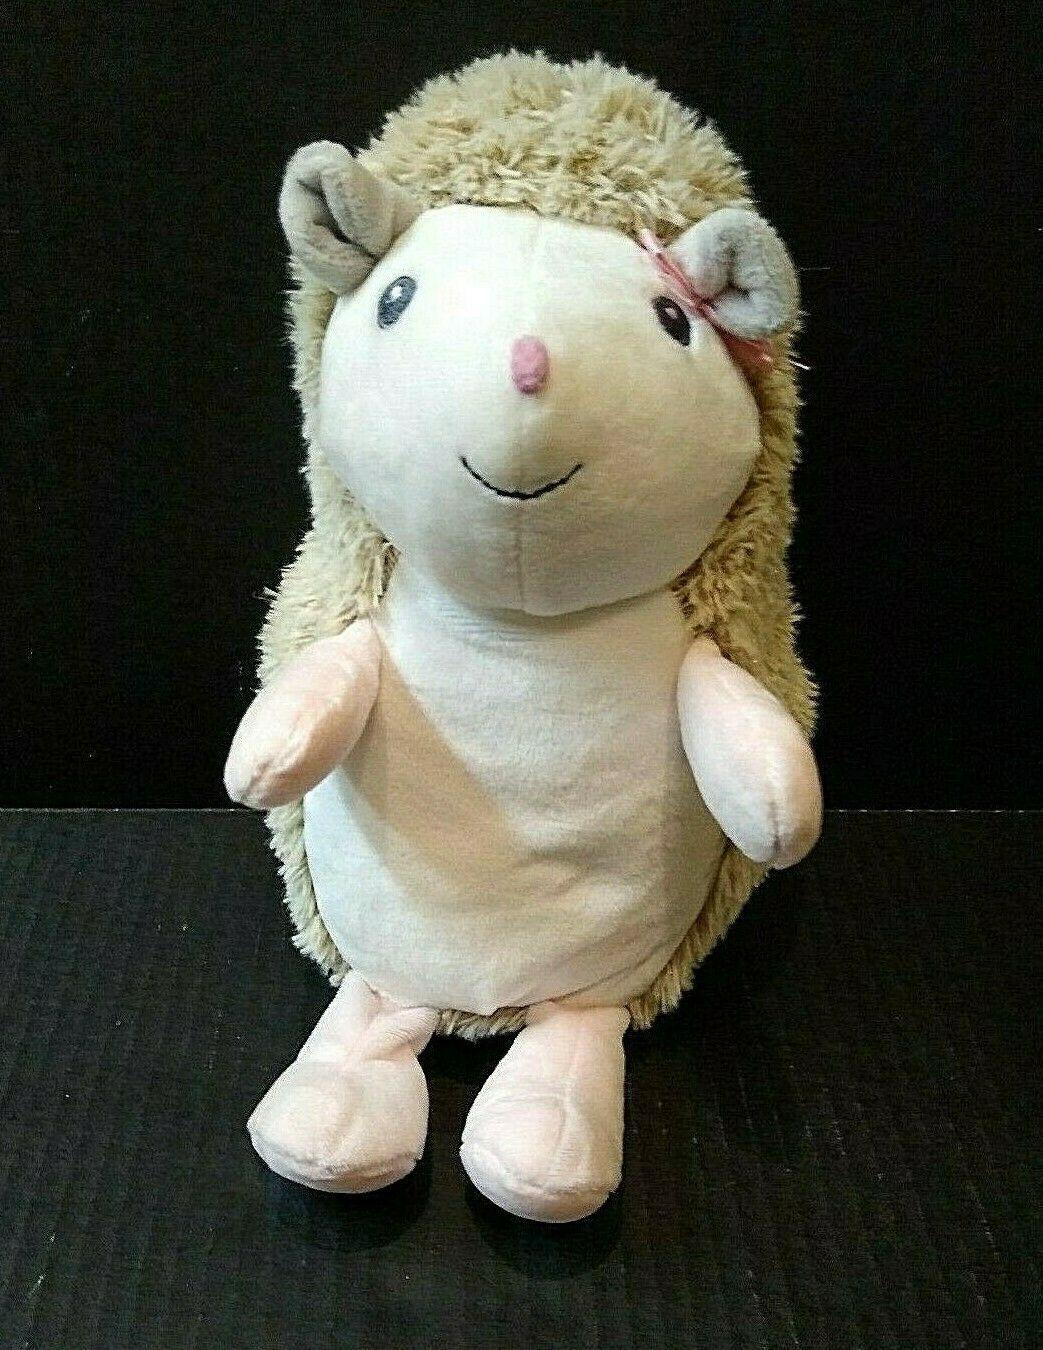 Blankets Beyond Baby Rattle Plush Hedgehog Stuffed Animal 9 Blankets And Beyond Baby Rattle Baby Security Blanket [ 1350 x 1043 Pixel ]